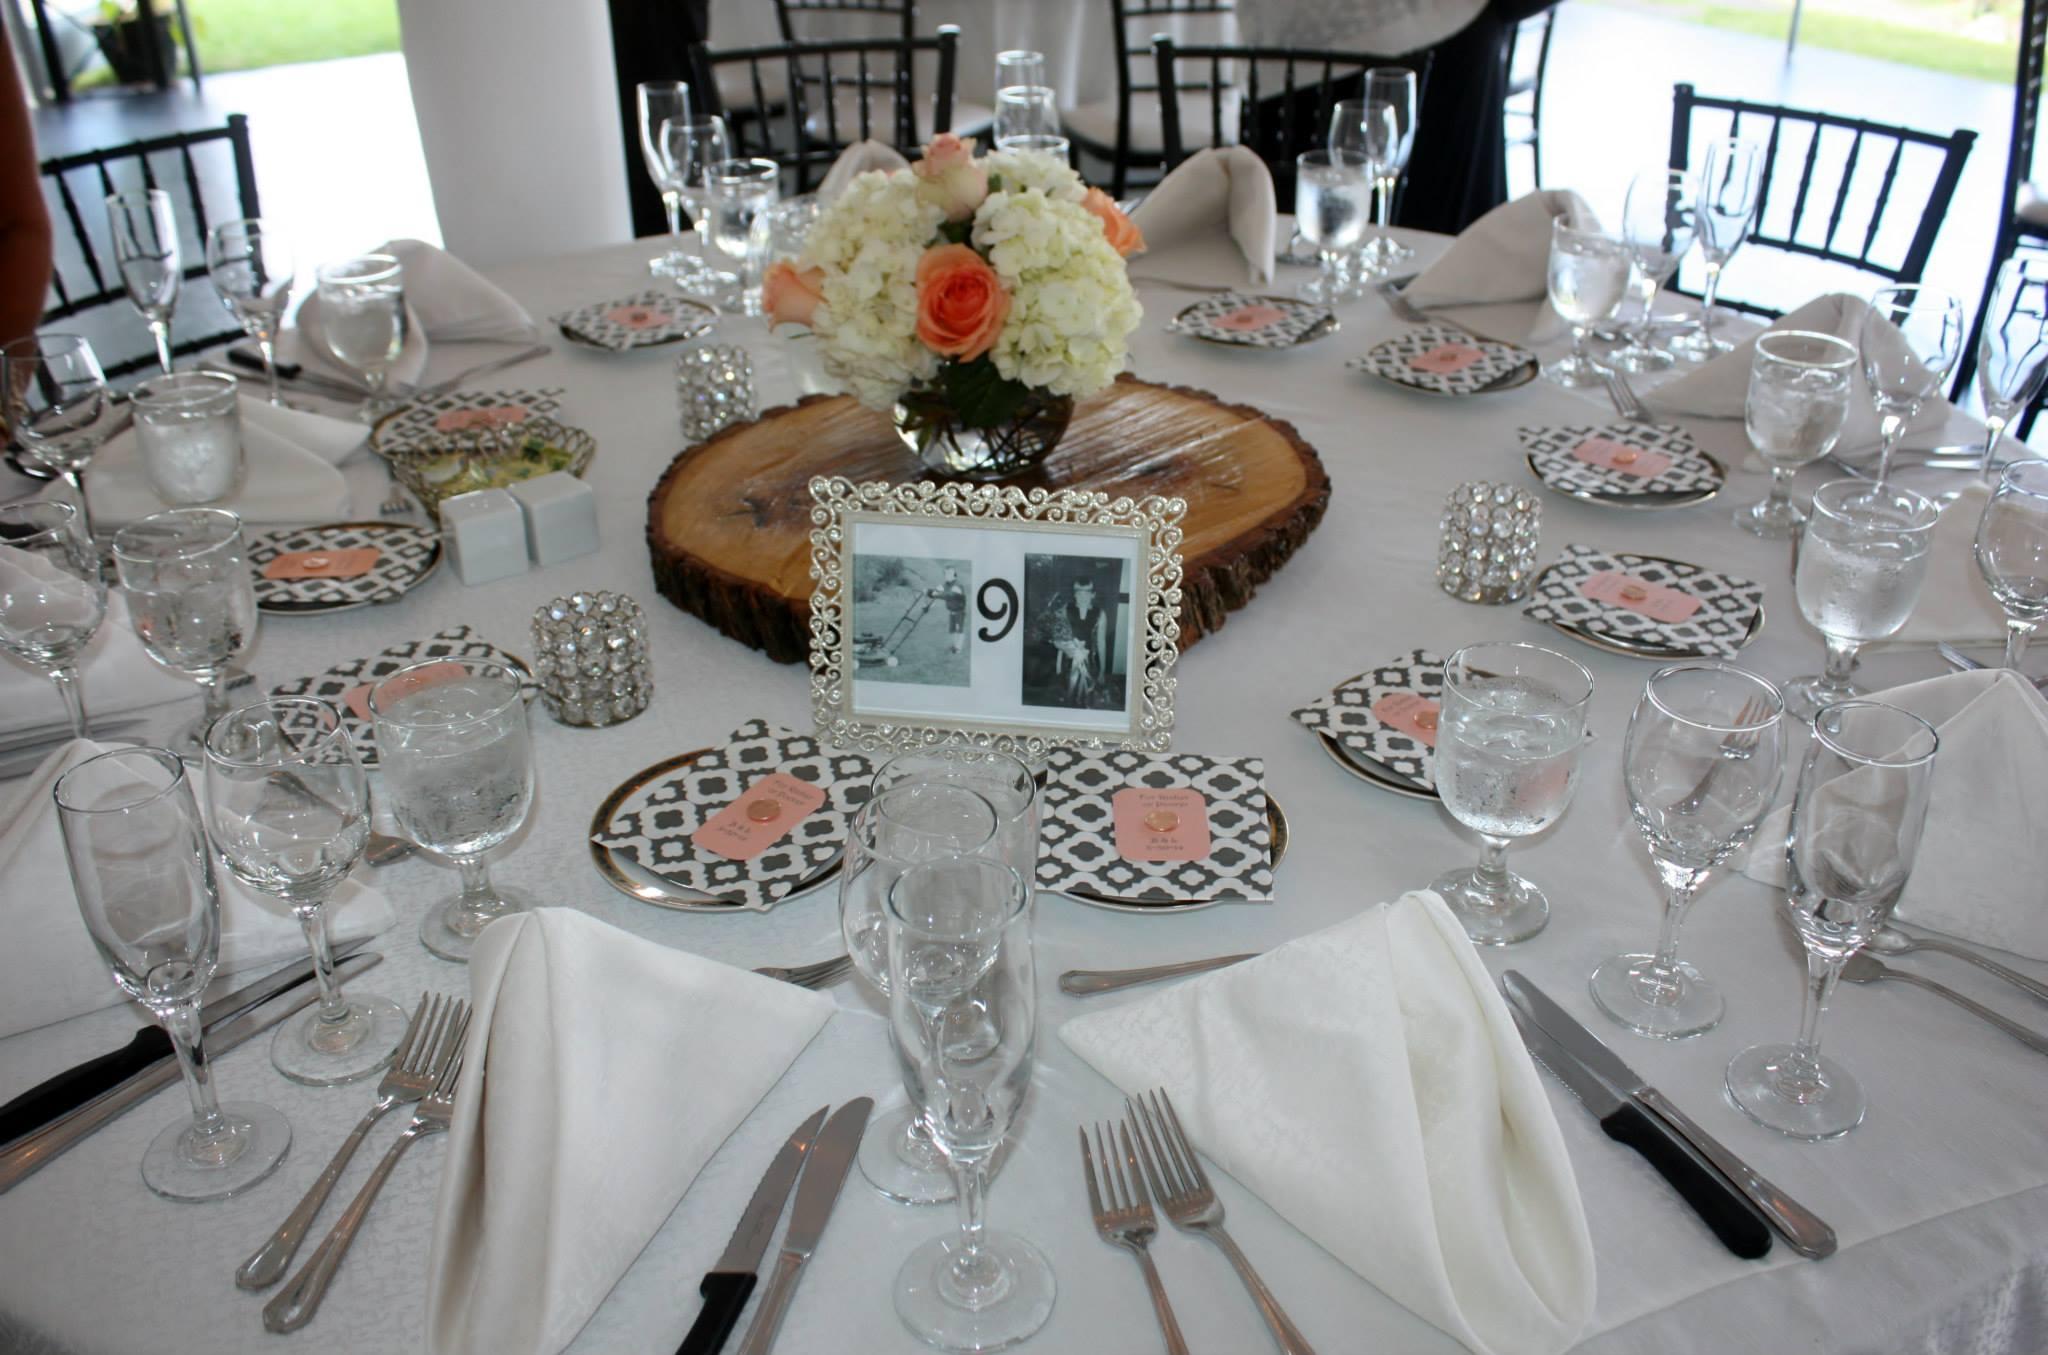 Rustic Wedding Decor-Wood Slices, Tall/Short